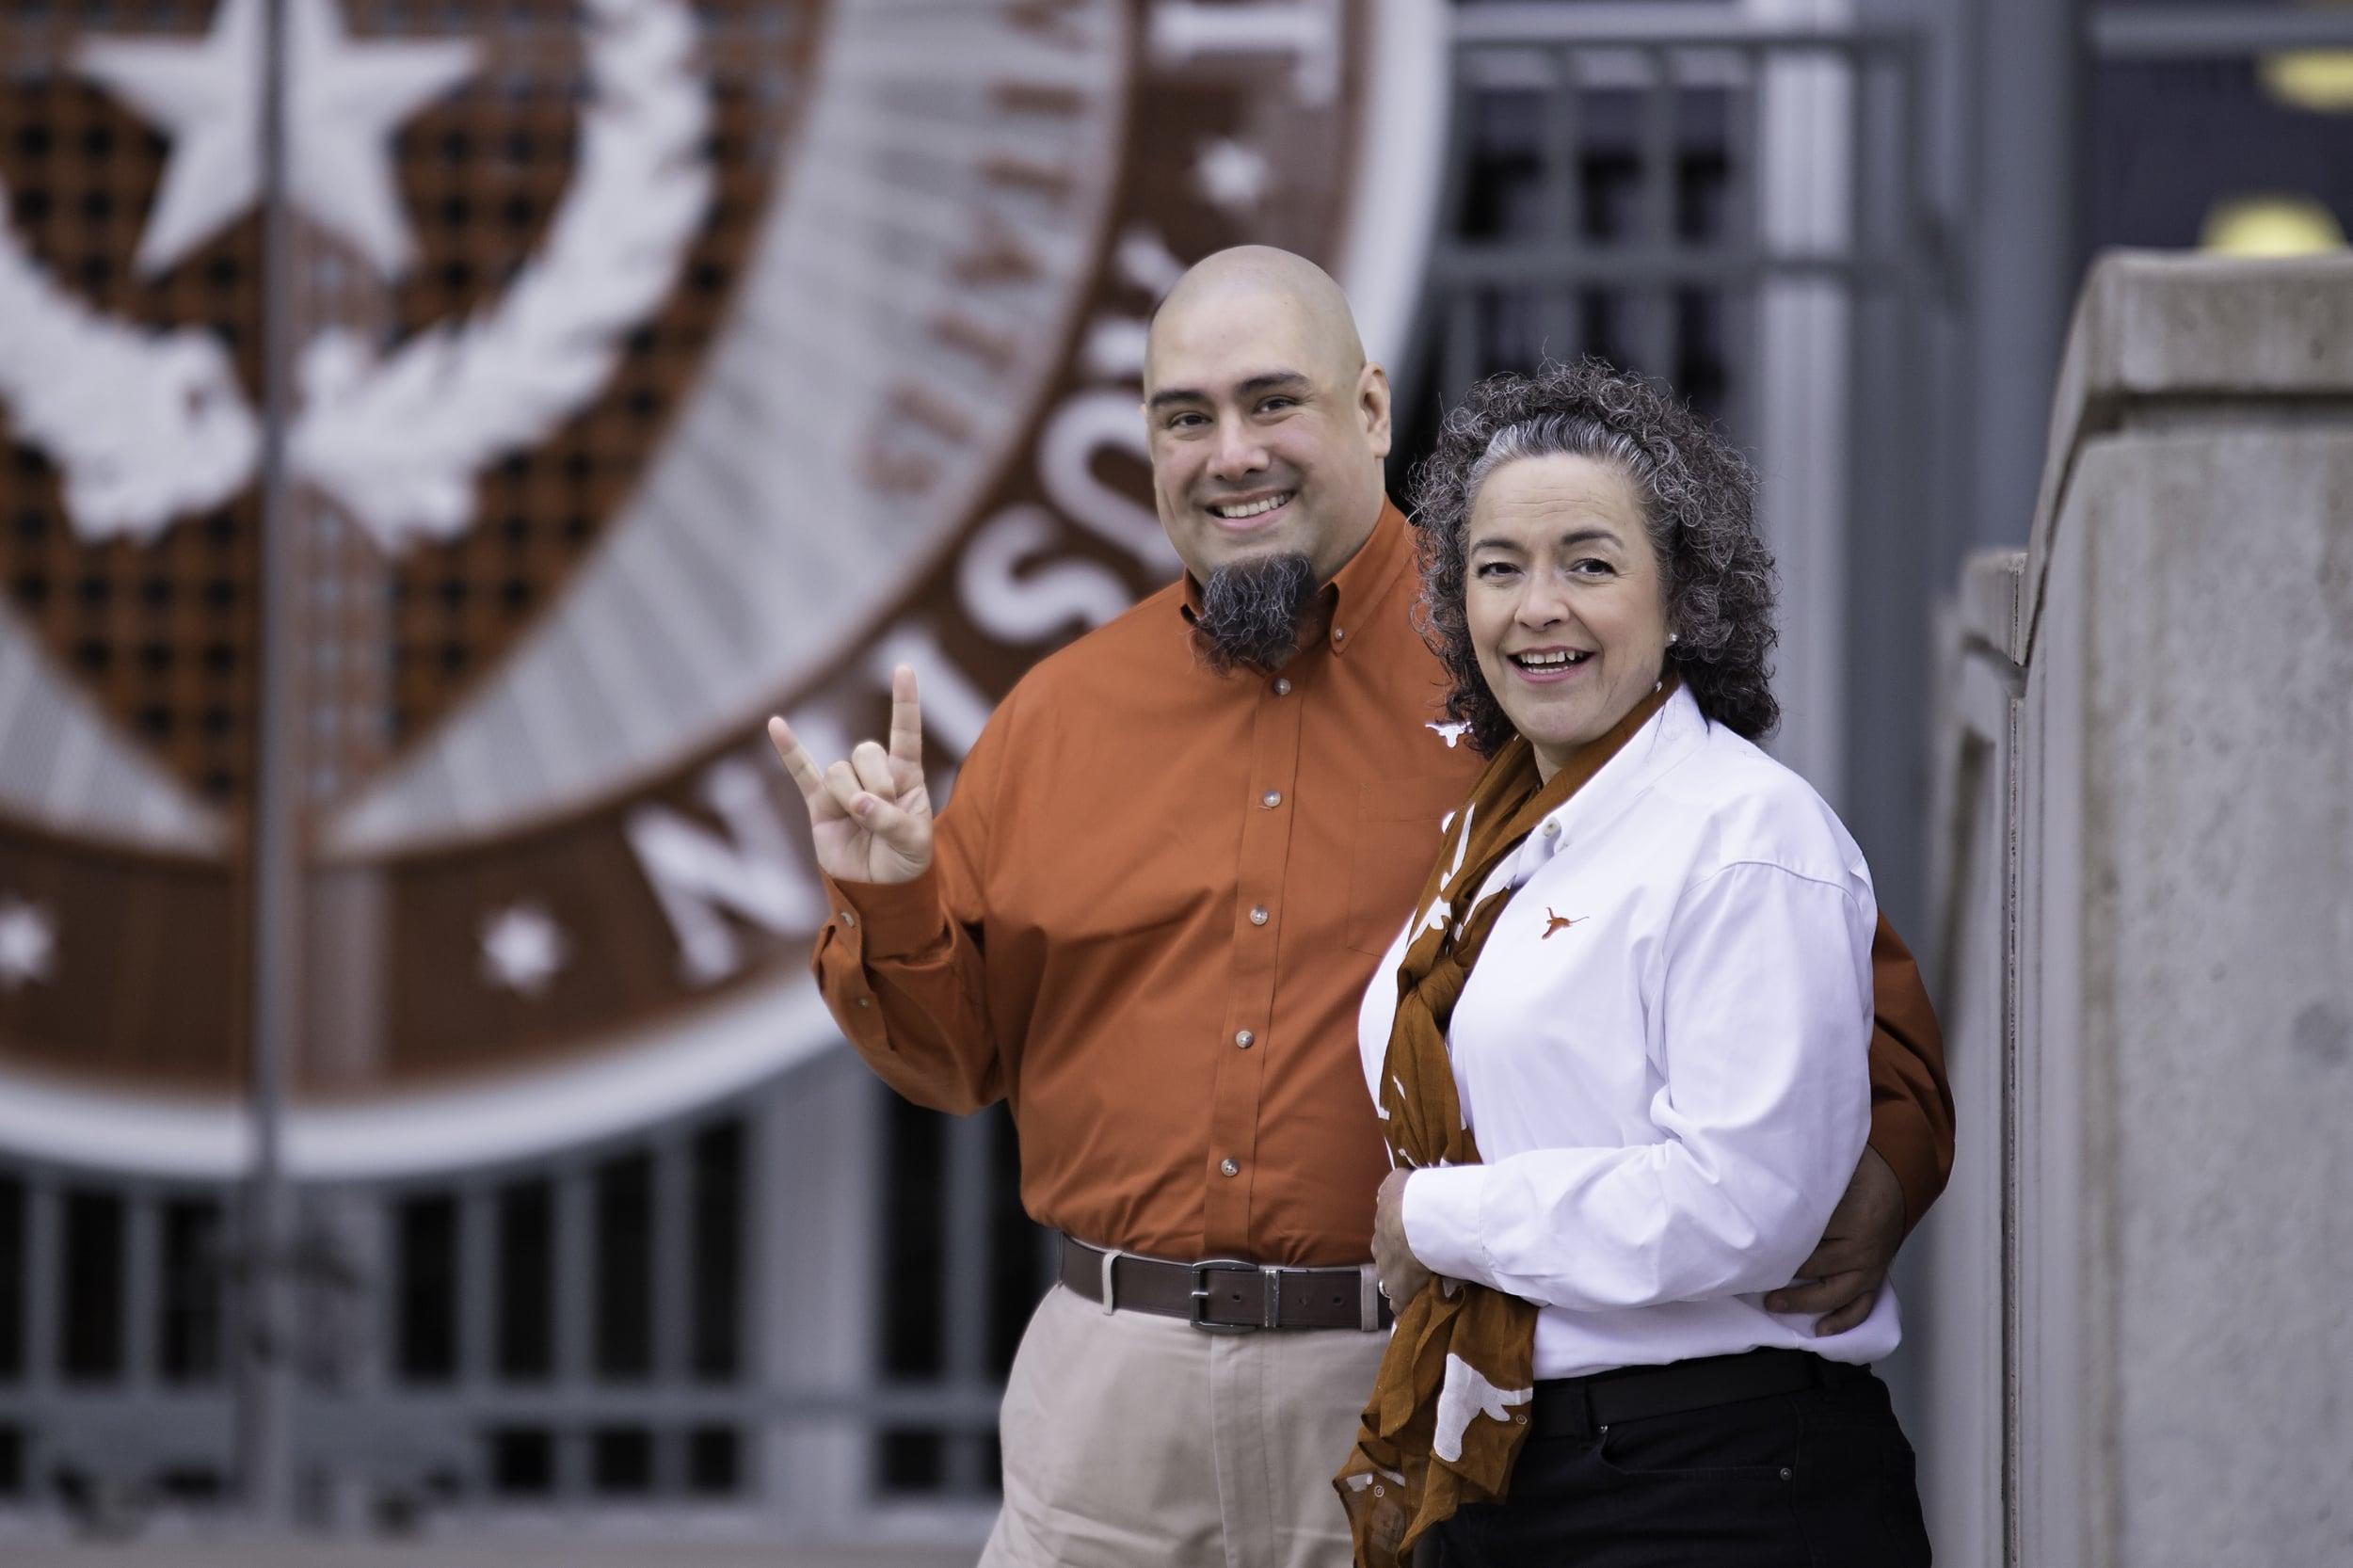 University_Texas_Engagement_Session_04